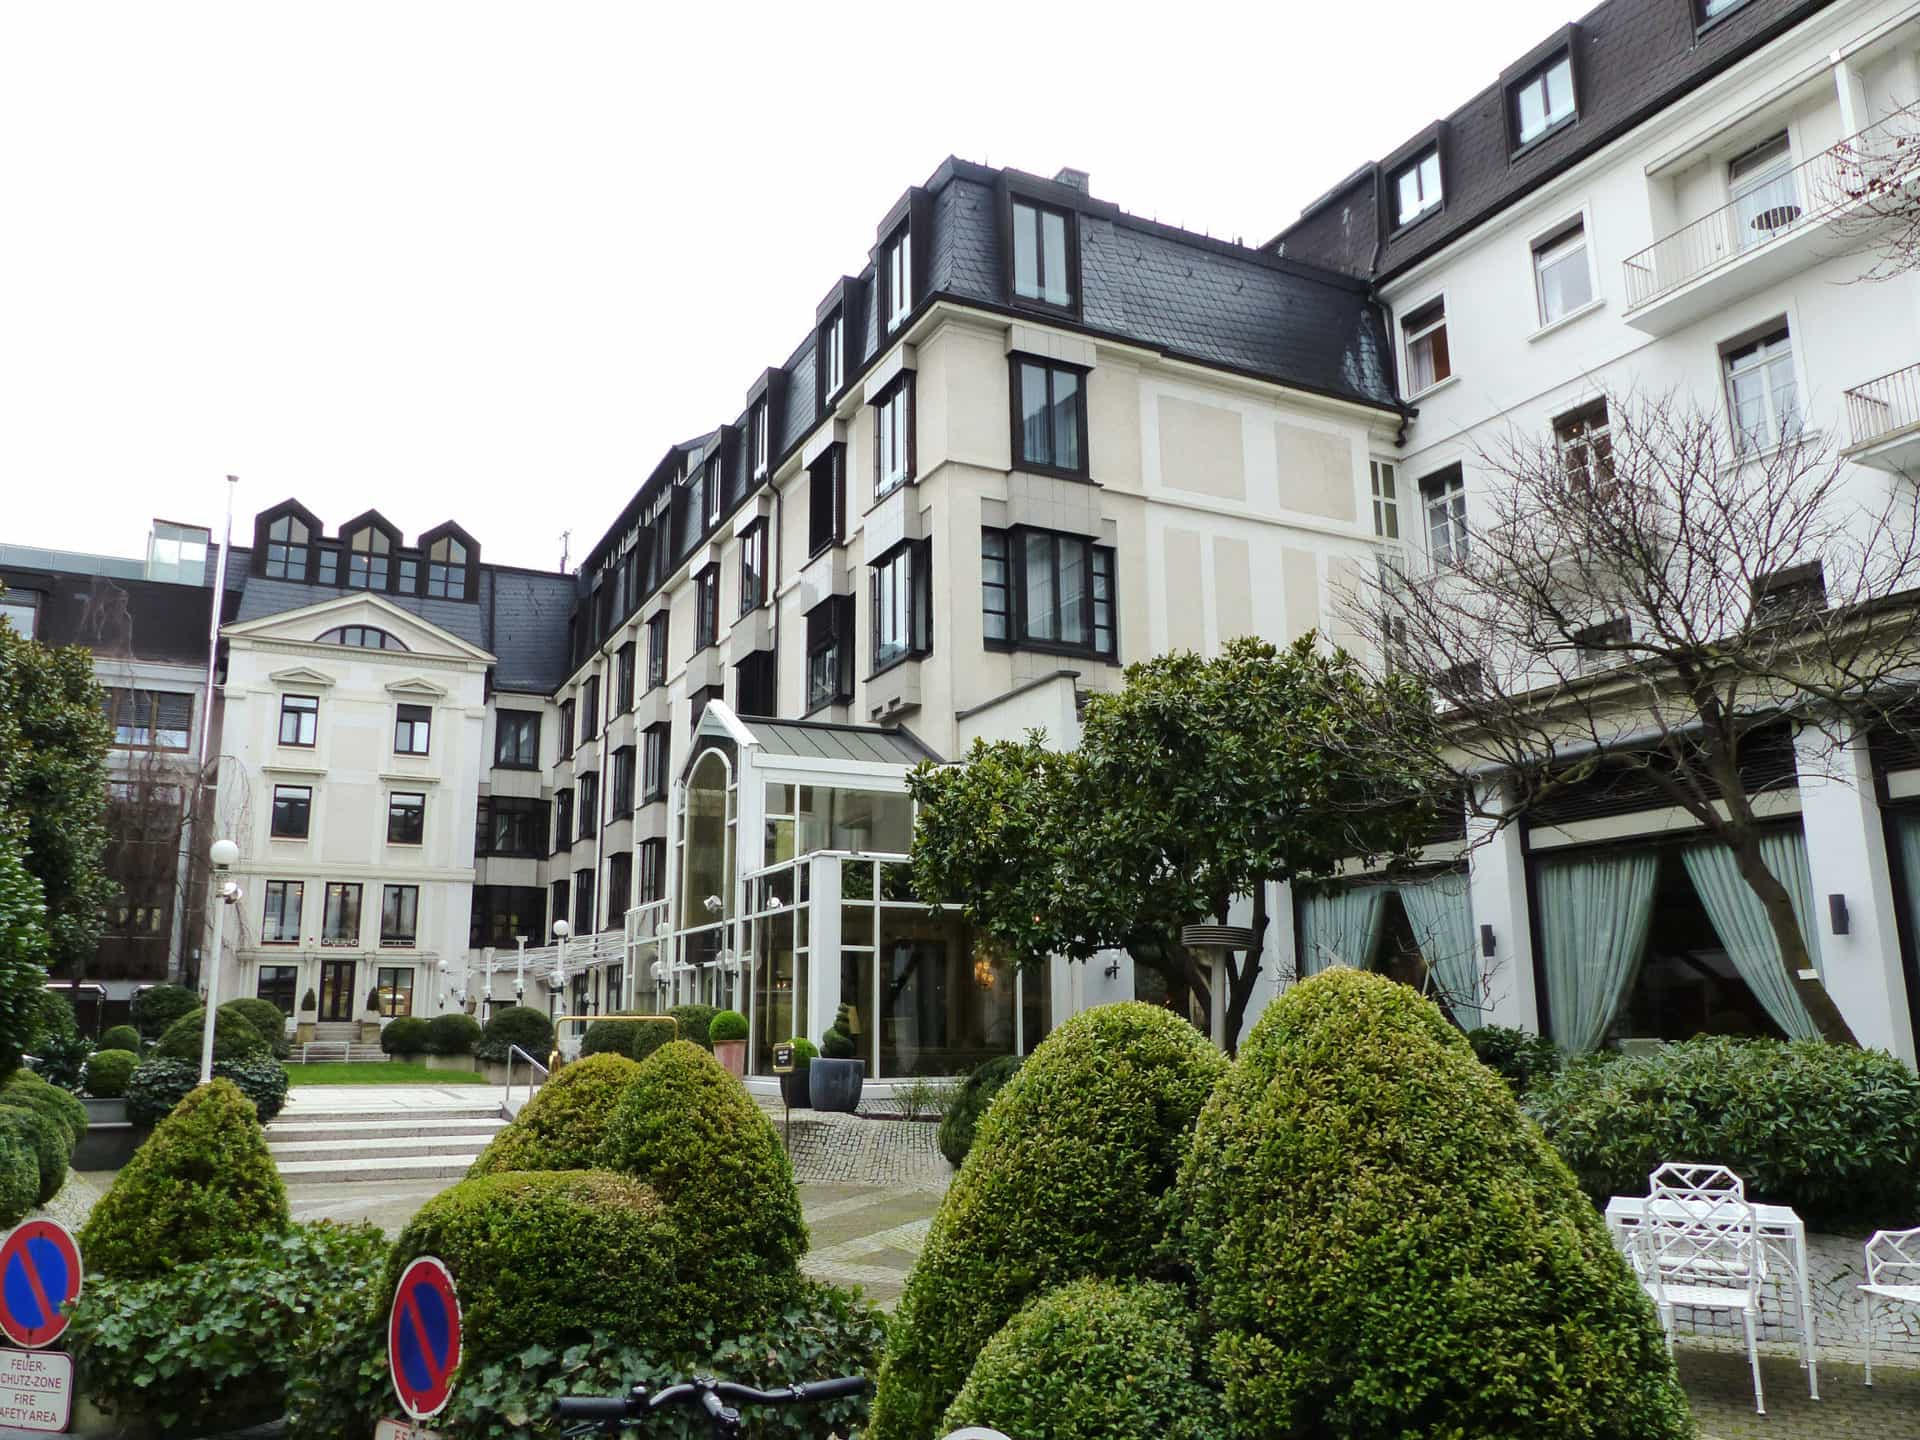 Europäischer Hof Innenhof